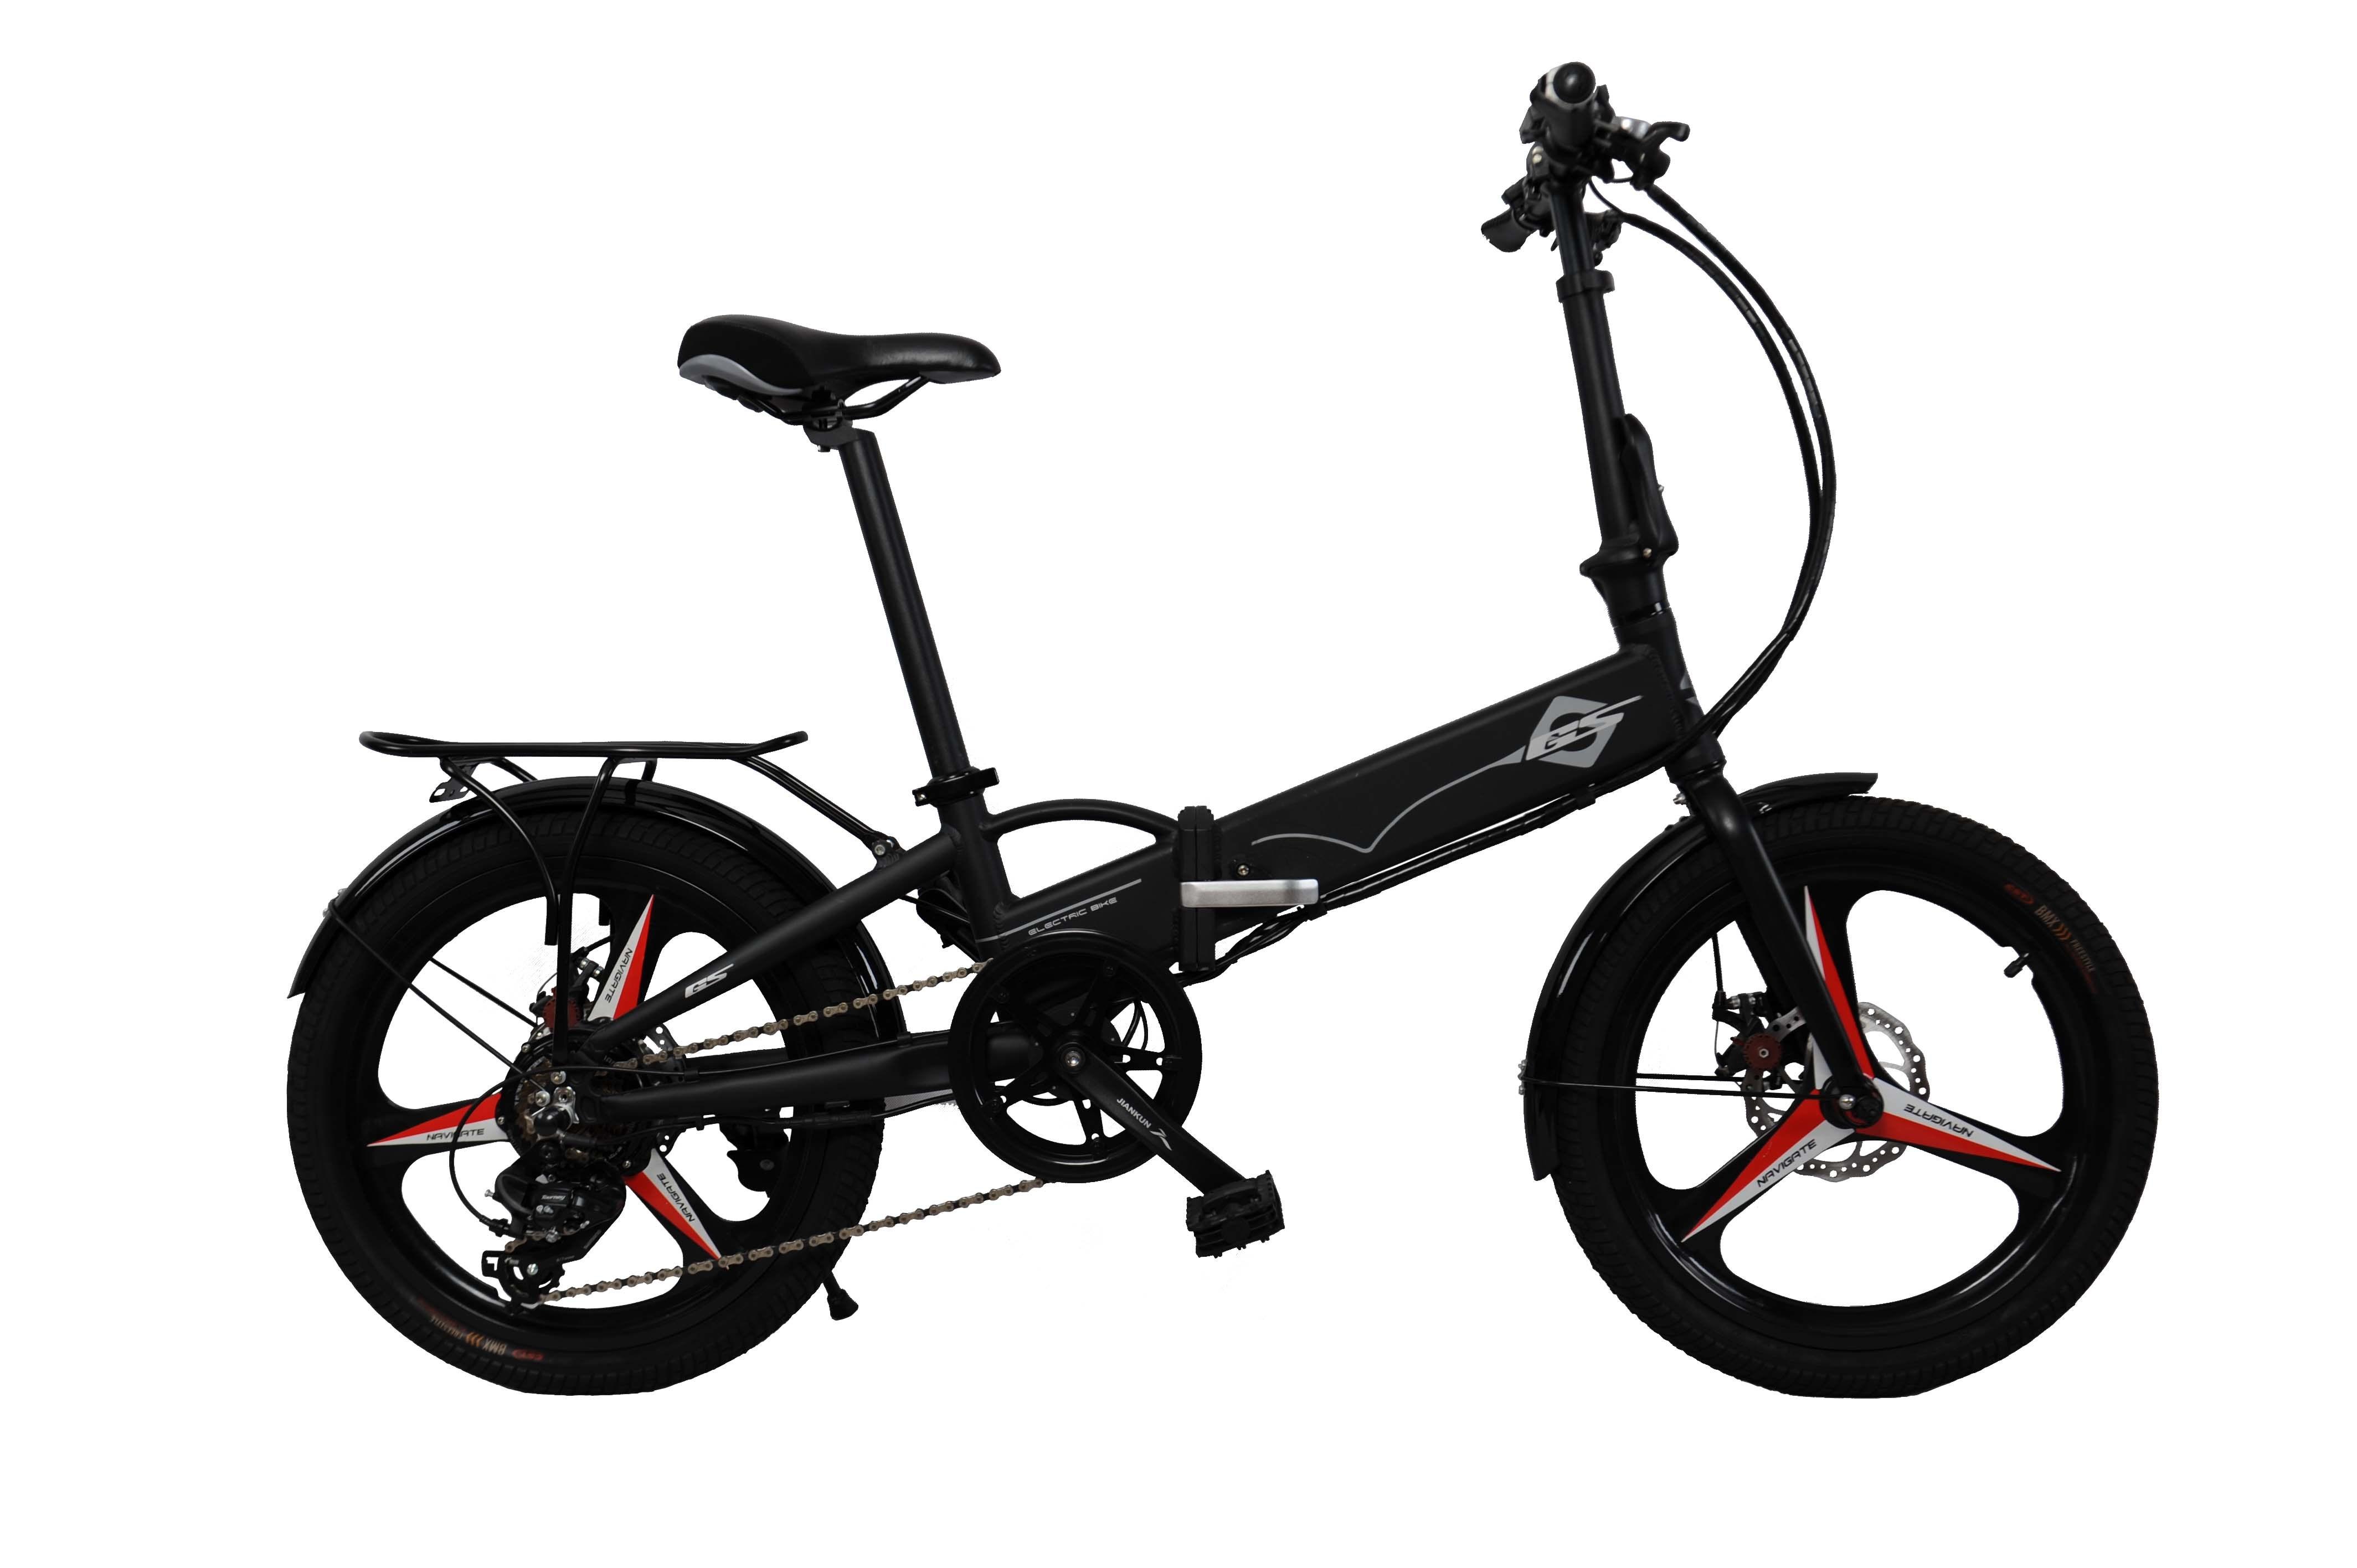 20 Inch Foldable Aluminum Alloy Electric Bike E-Bike